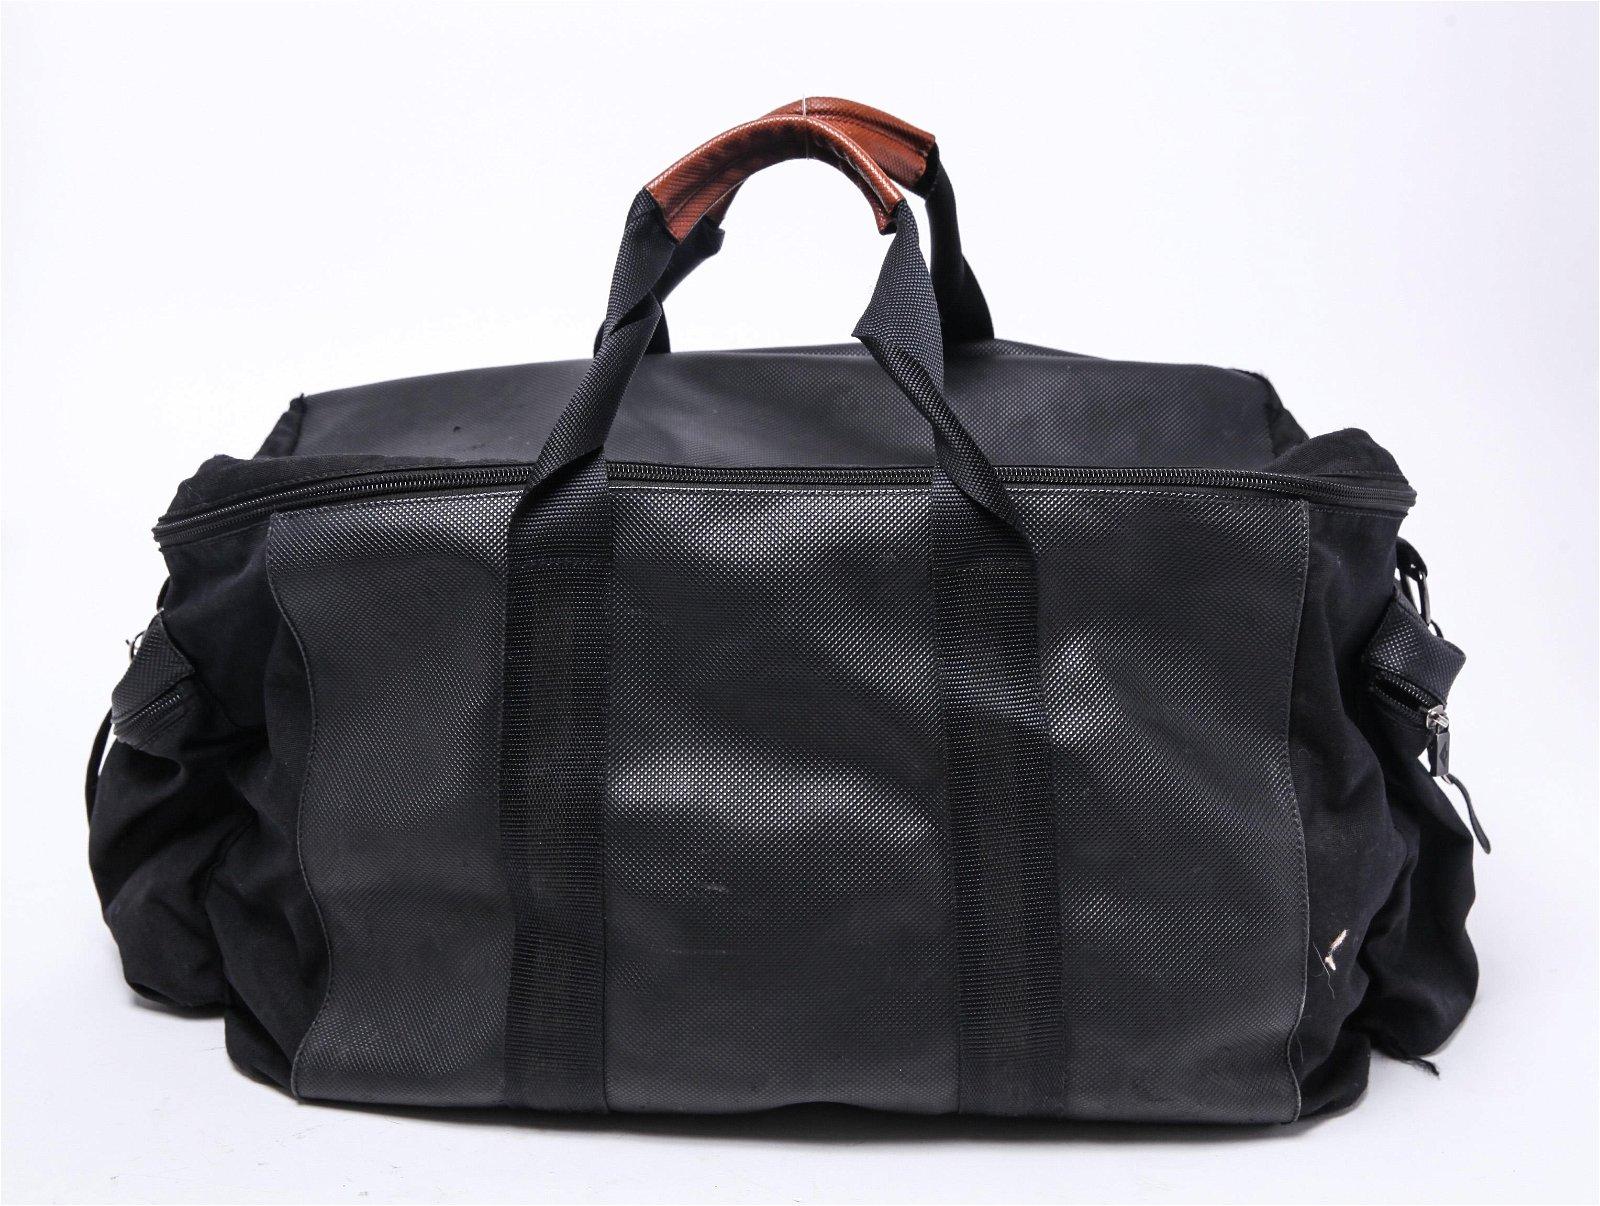 Bottega Veneta Leather & Canvas Travel Bag